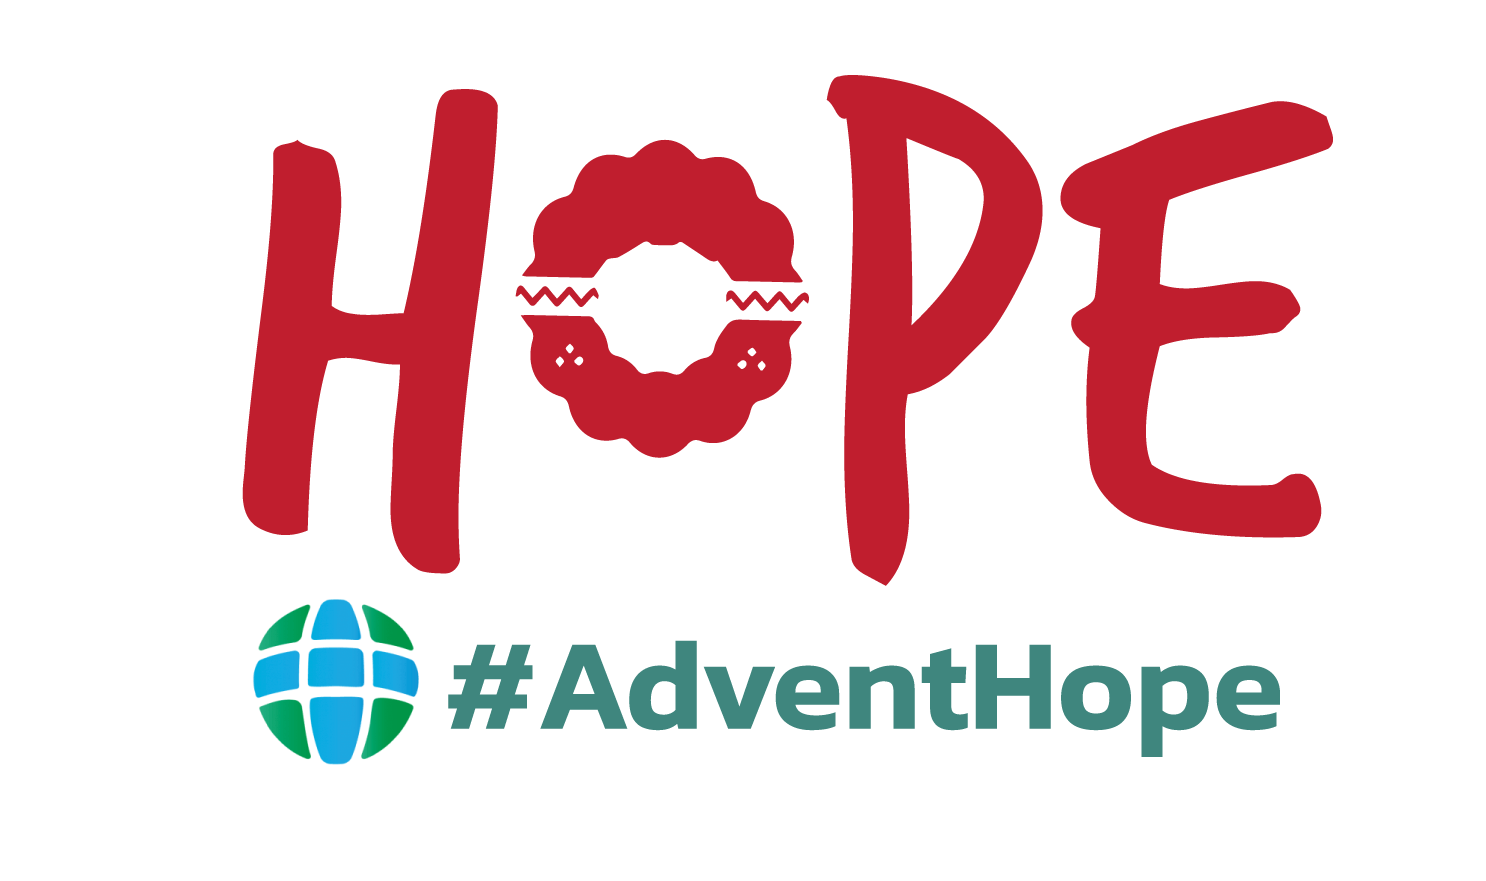 #AdventHope